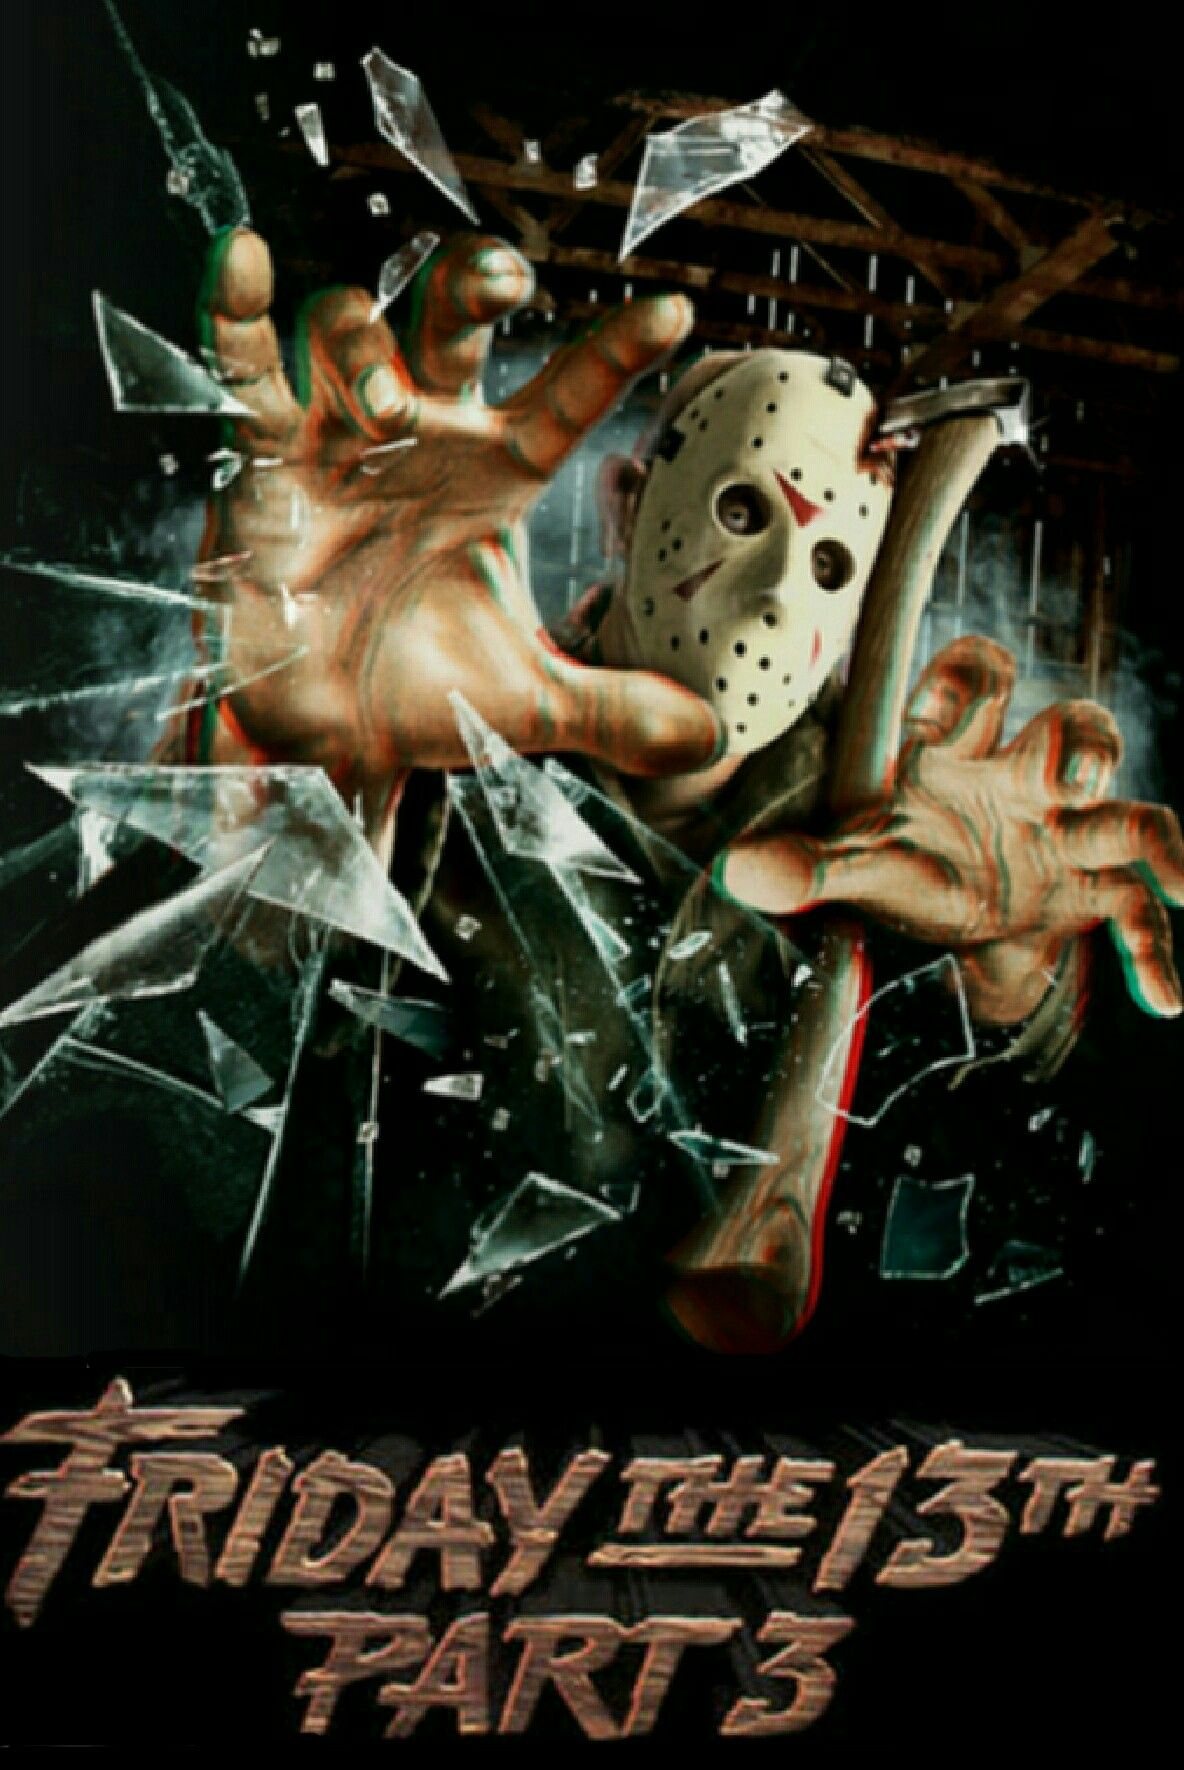 Friday the 13th part 3 horror movie poster Slasher | Carteles de ...